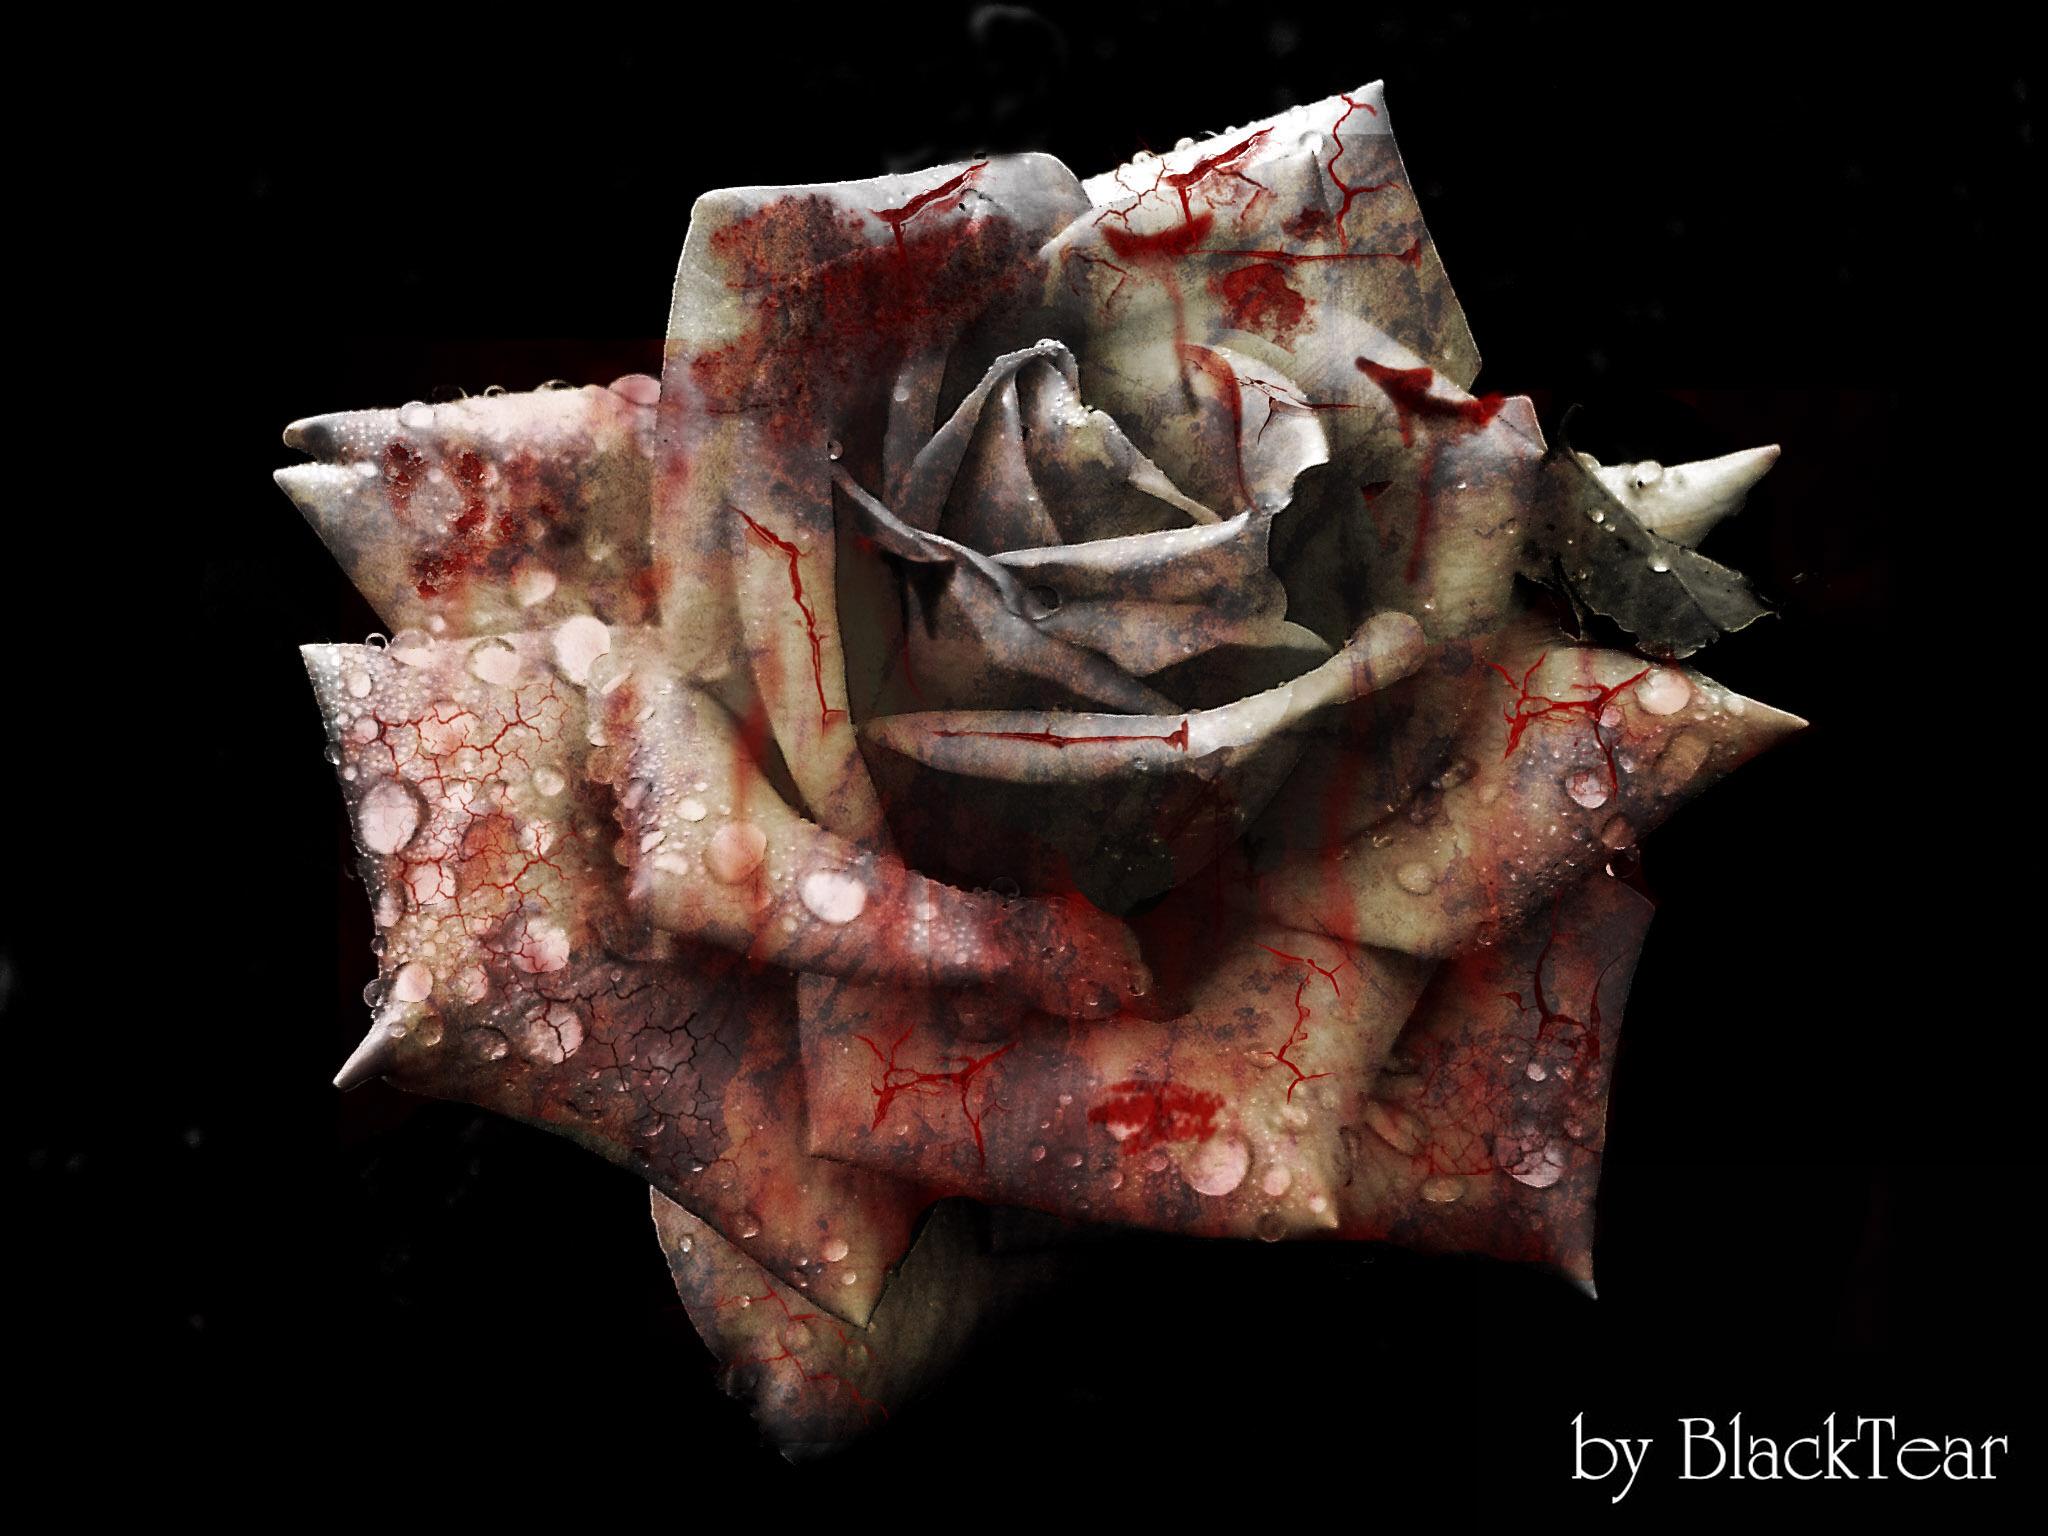 Dead_Rose_by_DeathsBlacktear.jpg